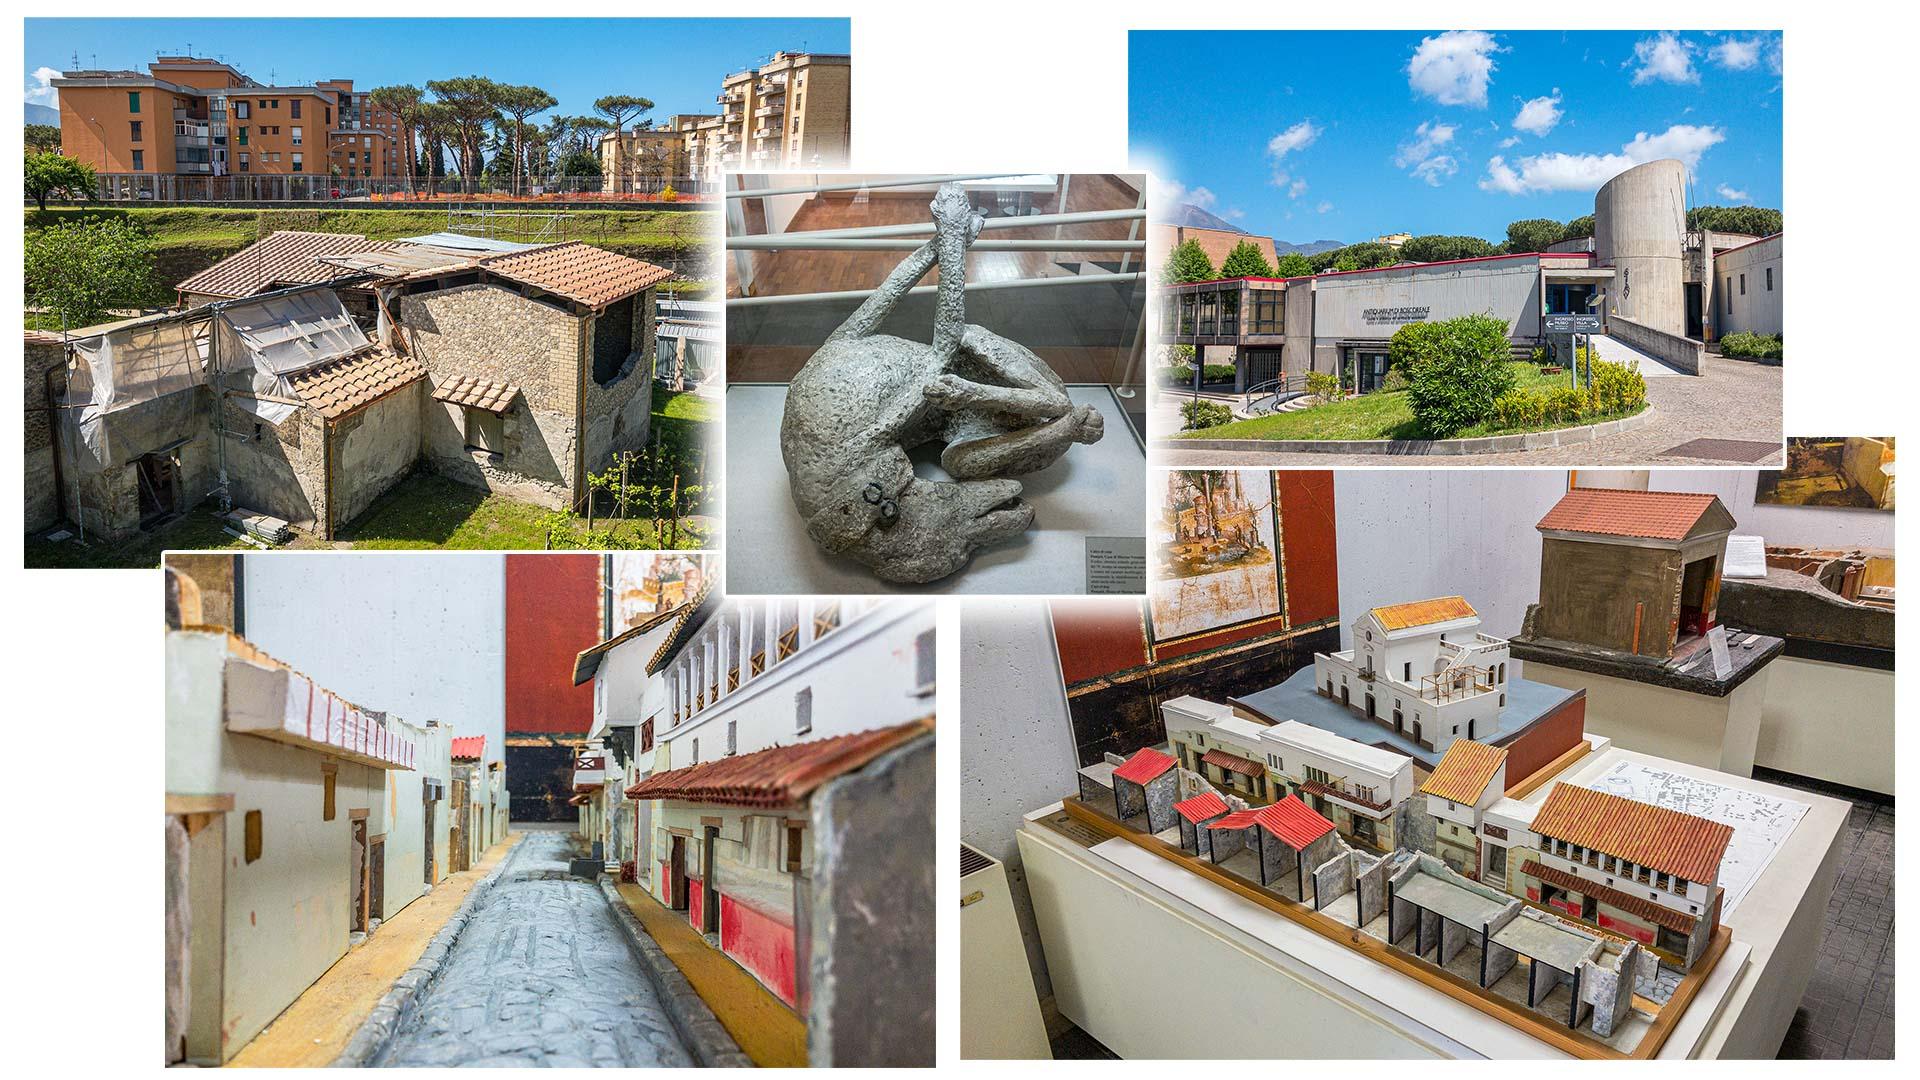 Музей, раскопки, вилла Регина, Боскореале, Помпеи, Италия